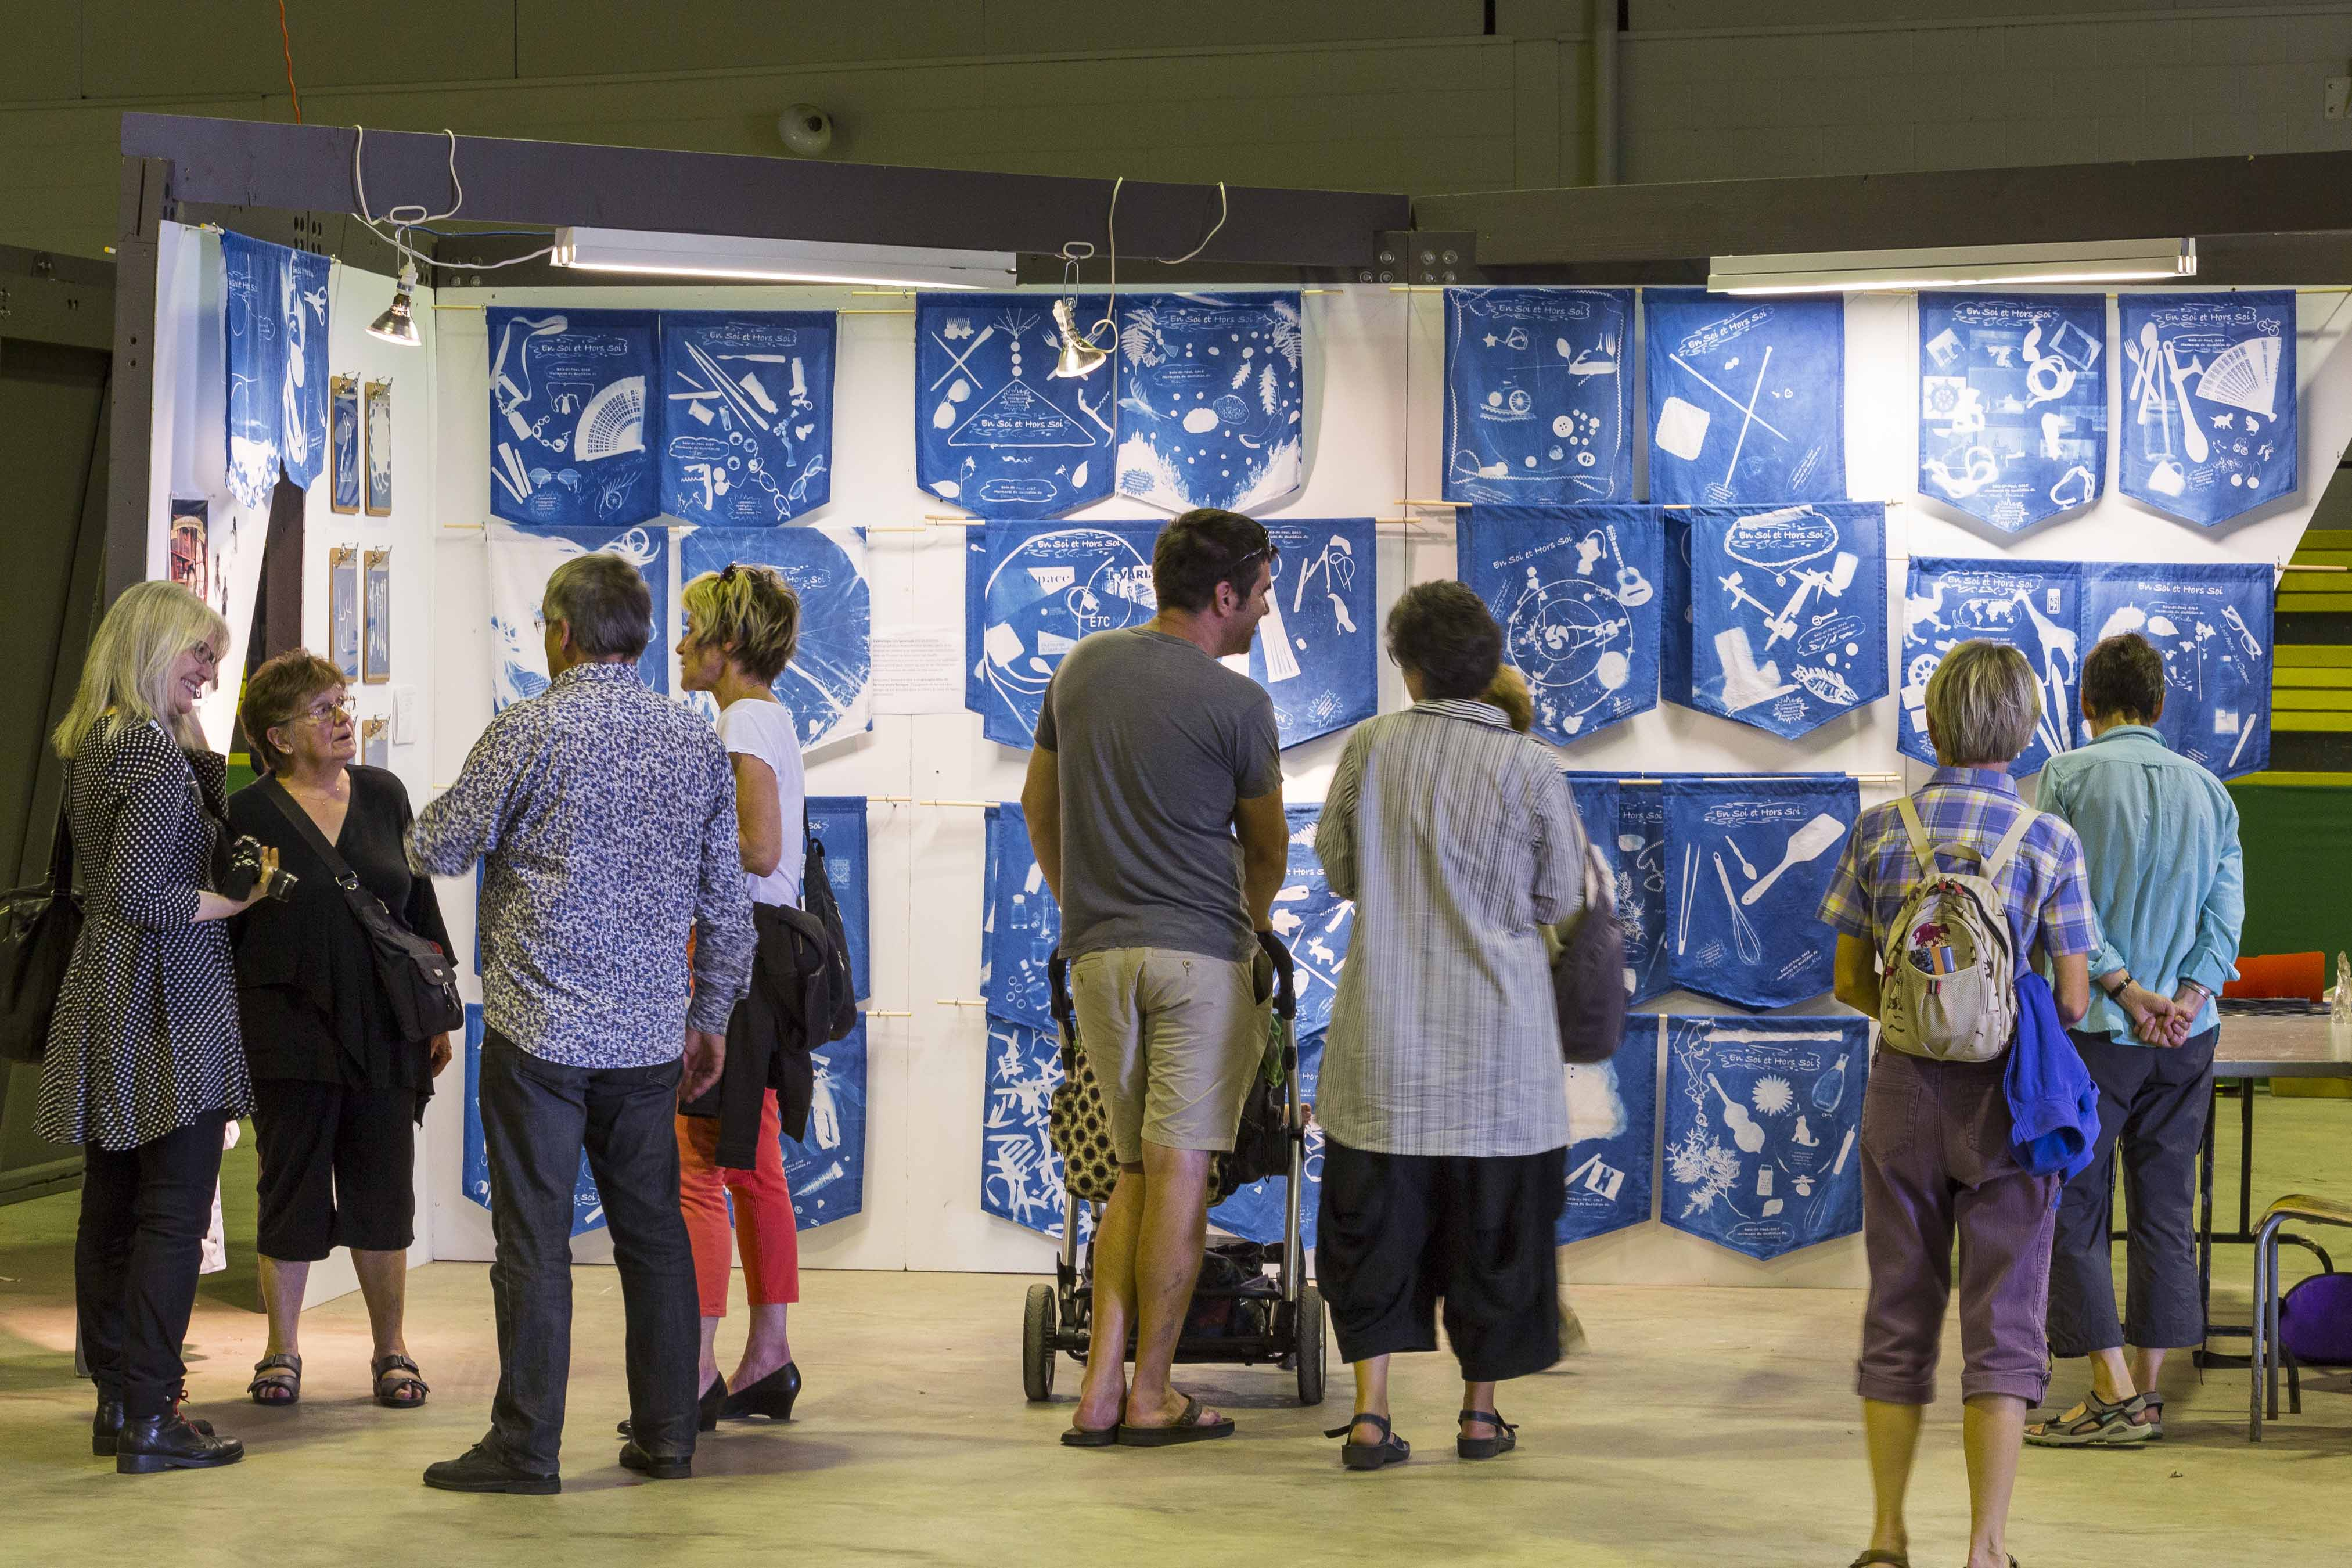 04_Mireille Perron_33e Symposium international d'art contemporain_Photo René Bouchard_BR